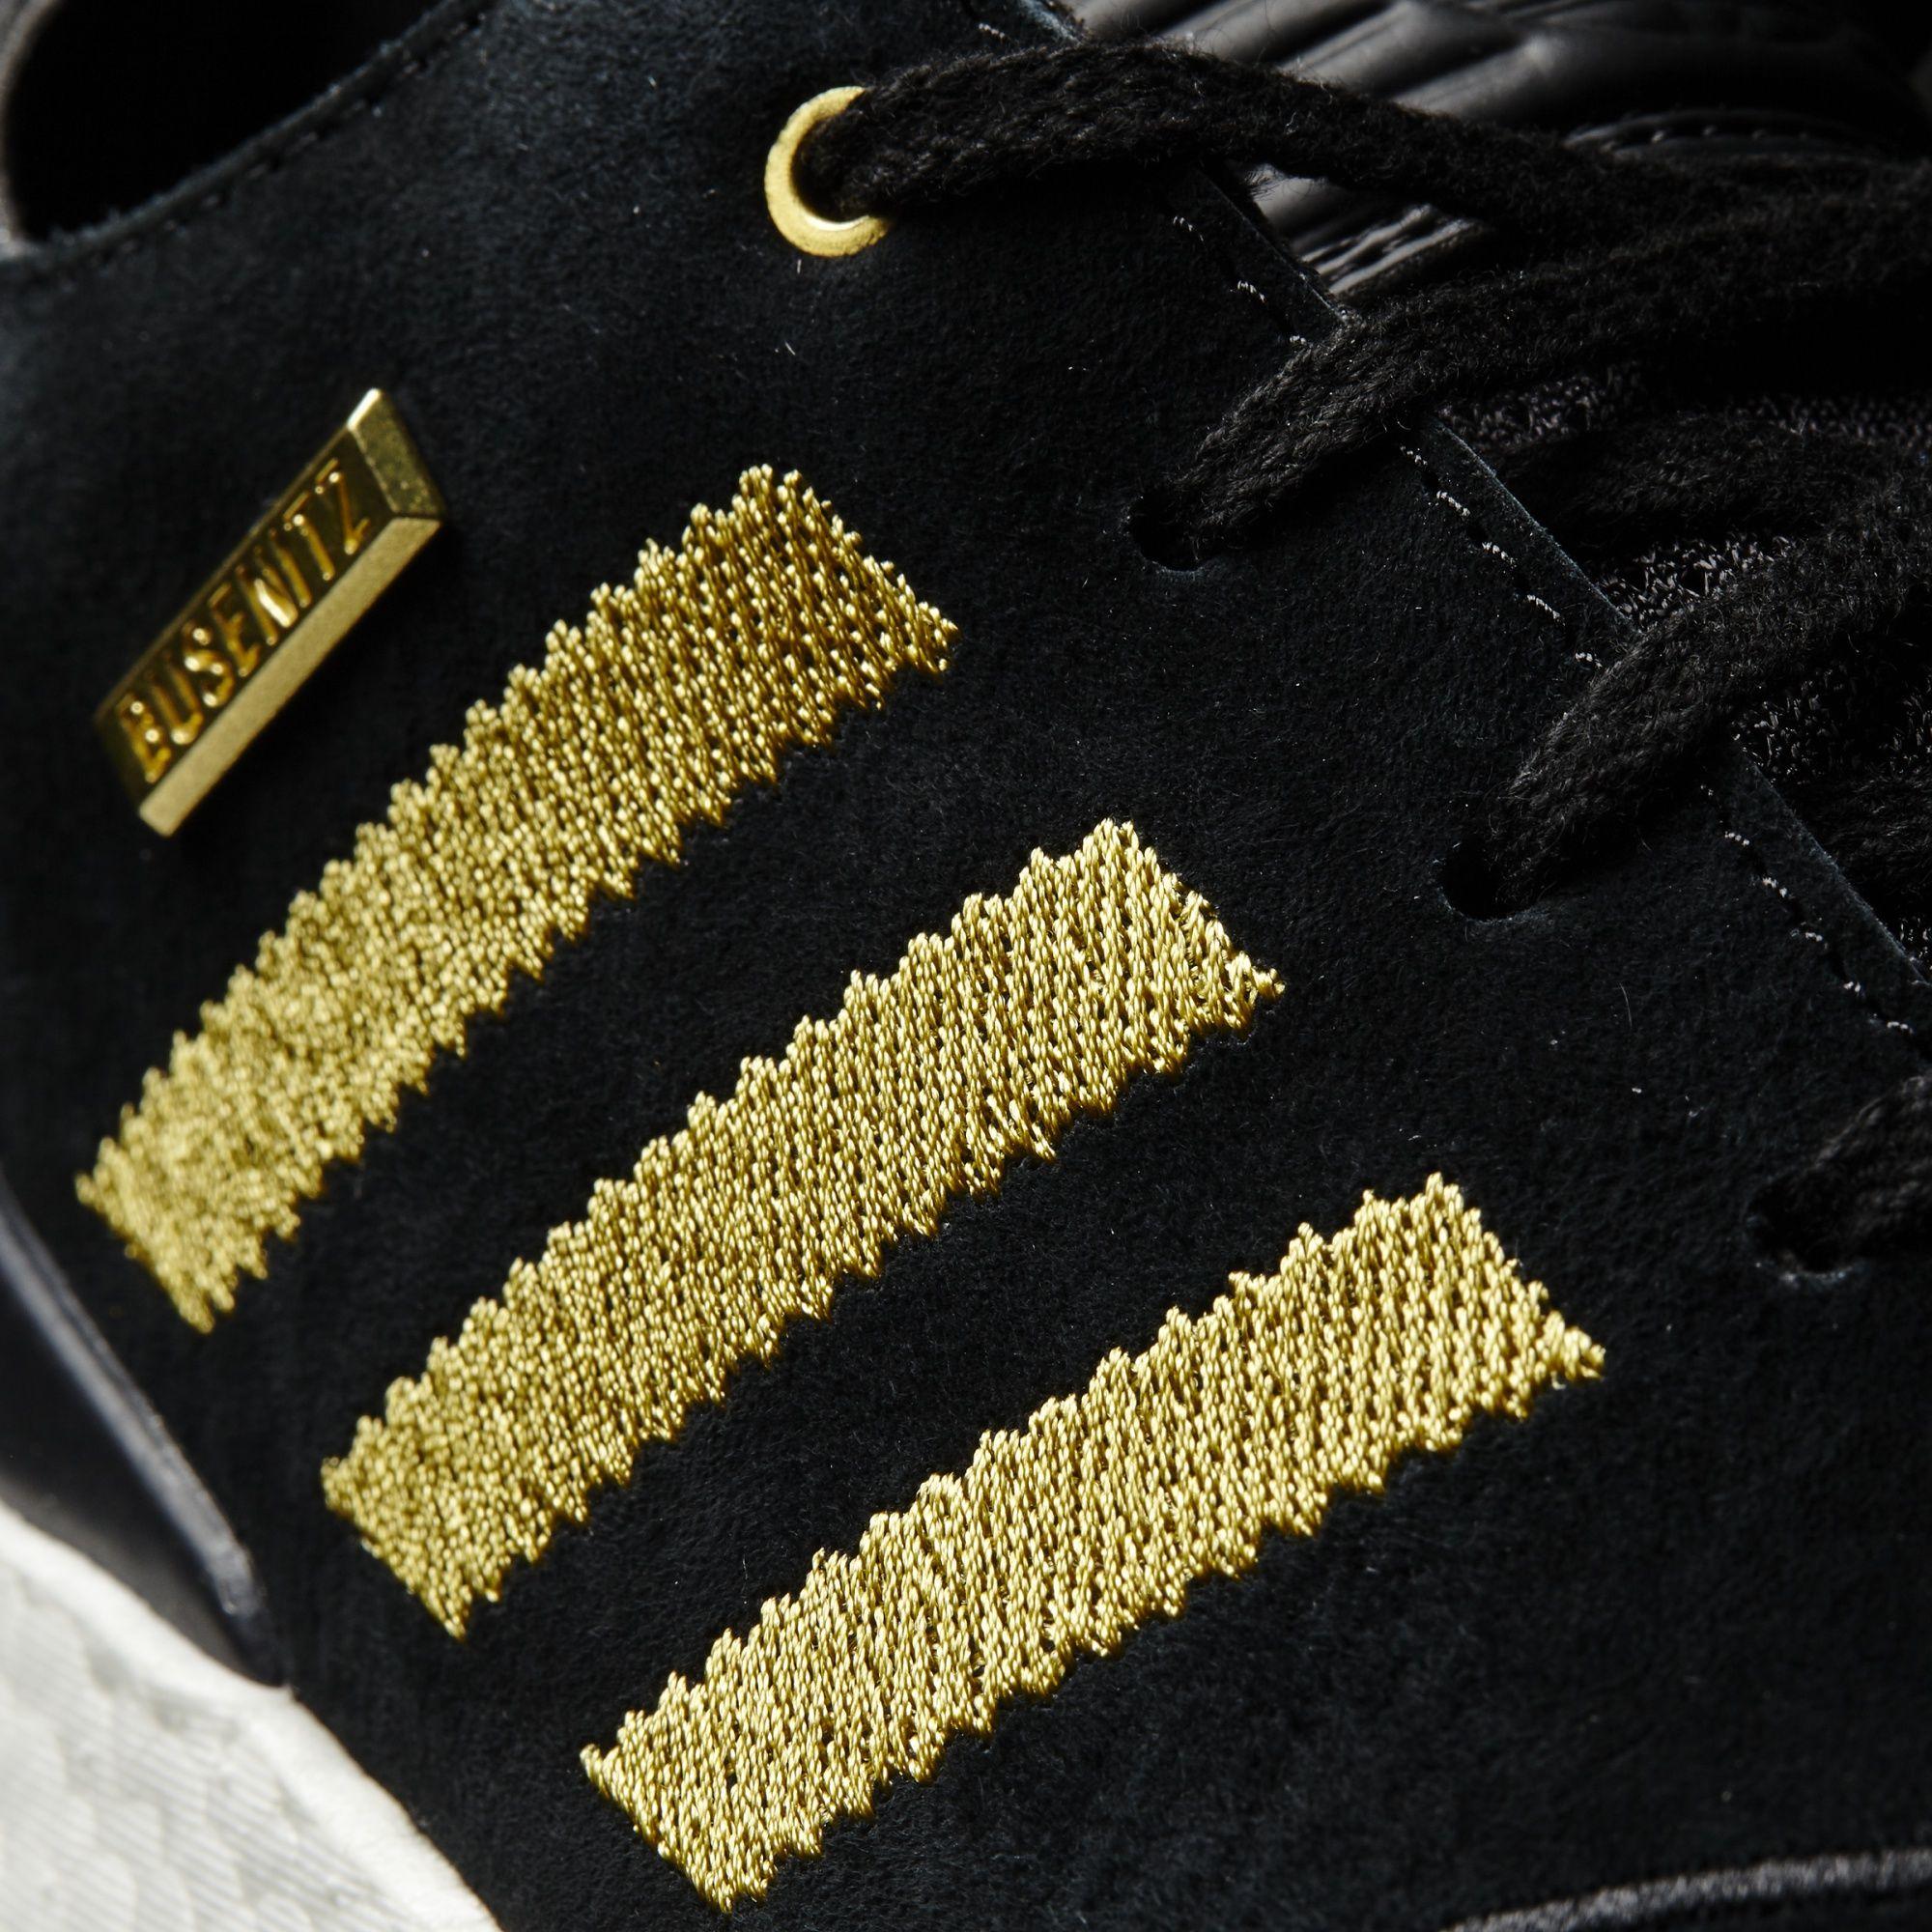 Adidas Busenitz 10 Year Anniversary Black Gold Detail